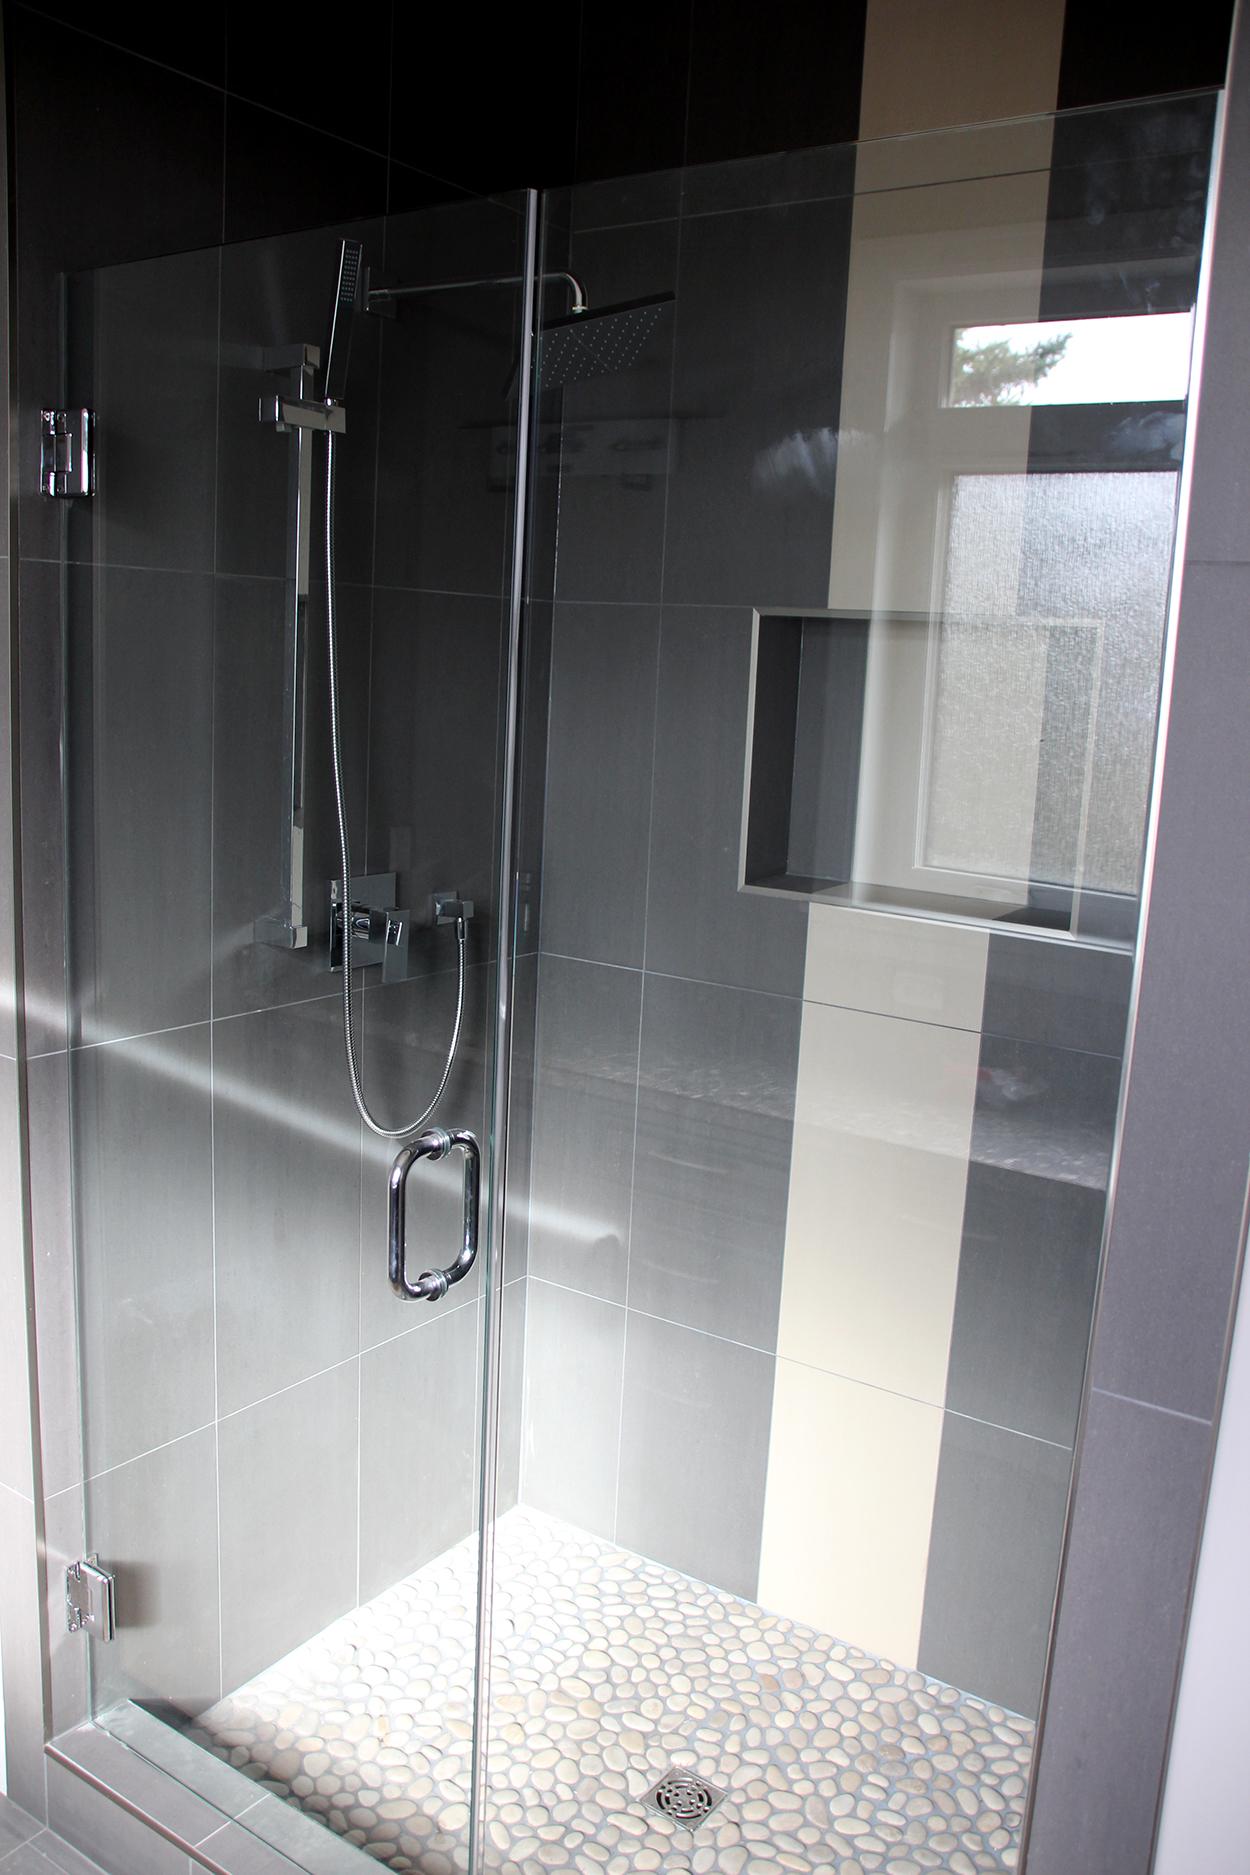 WMH-Bathroom-09.jpg